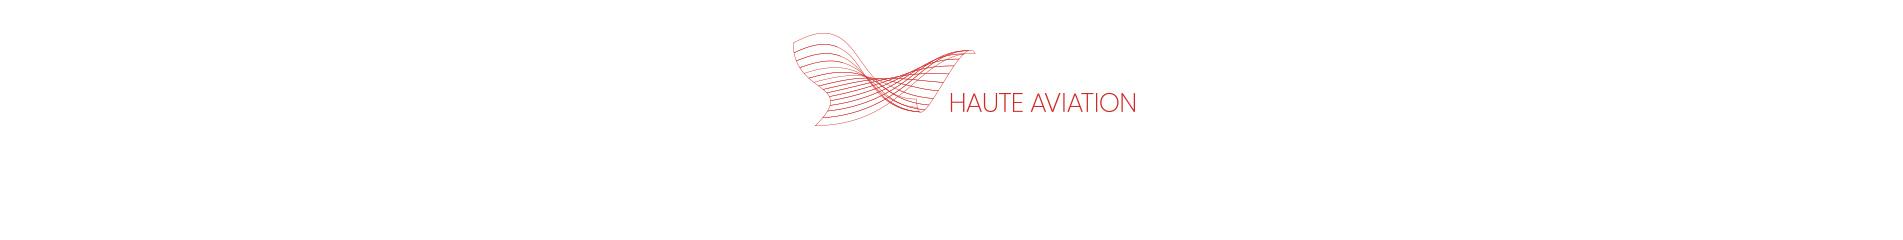 Haute Aviation | Swiss Charter Company